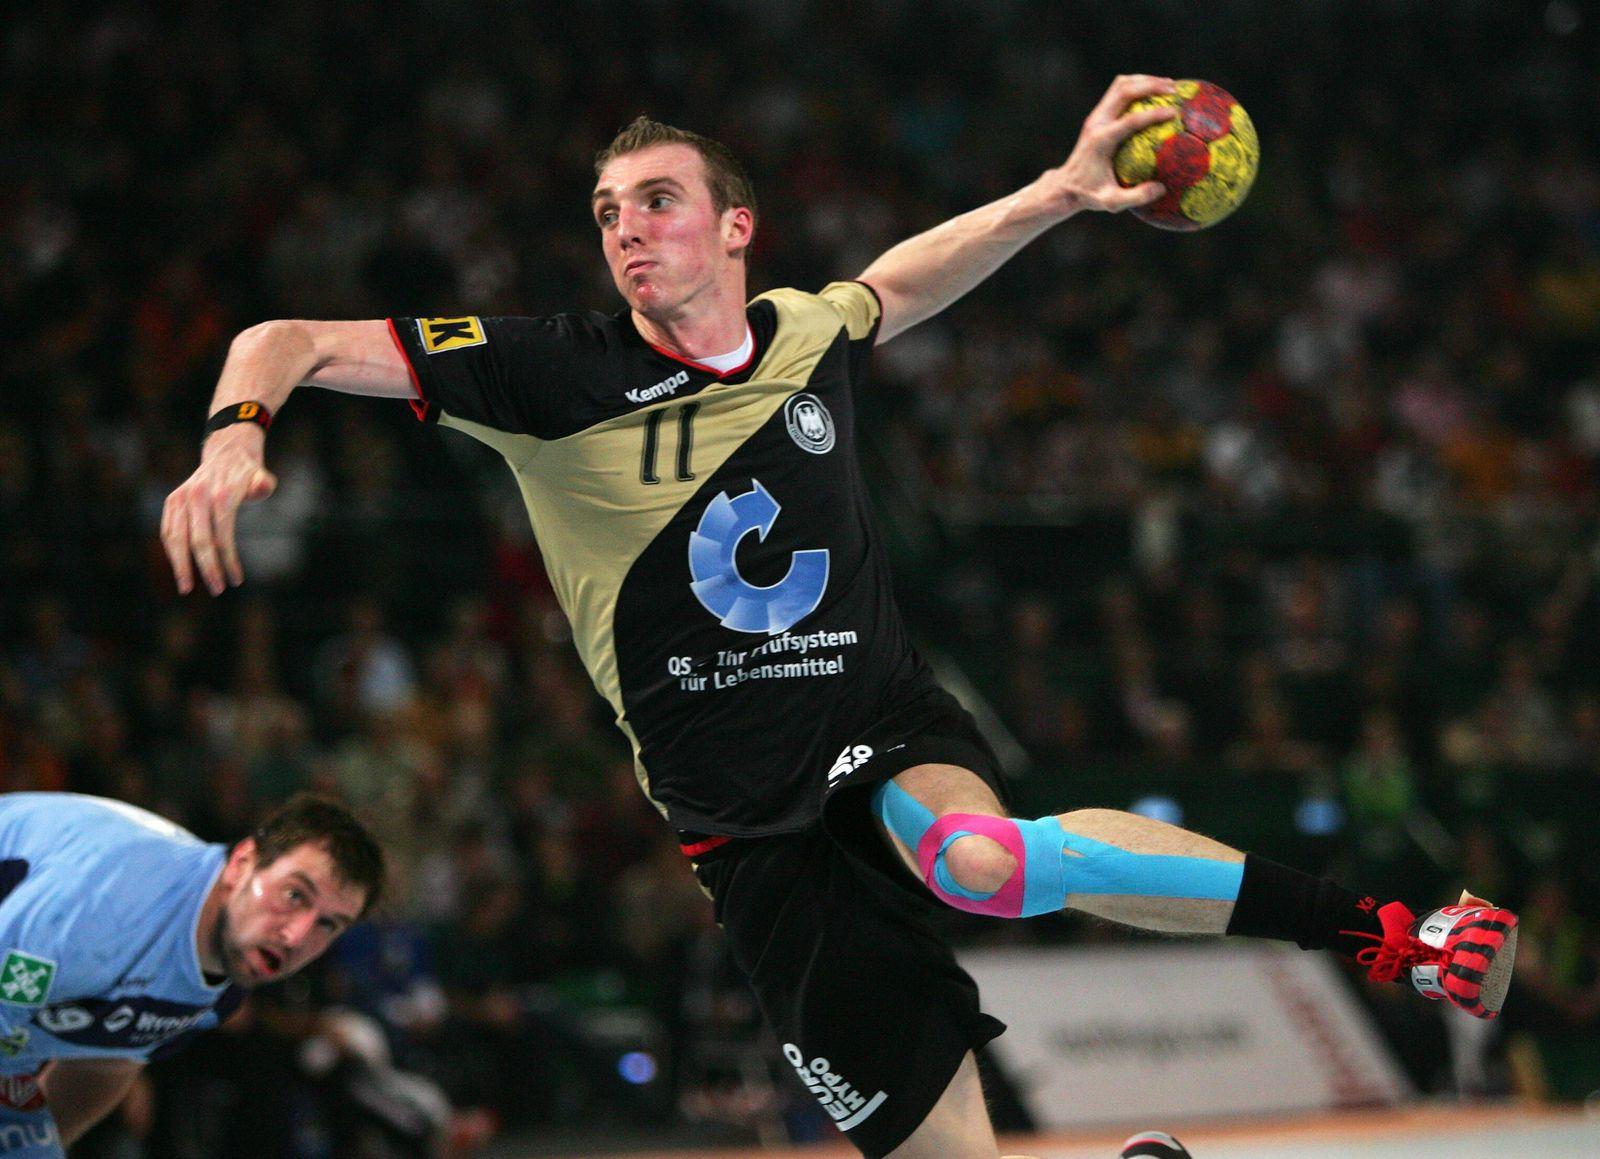 handball wm wie hat sich der handball